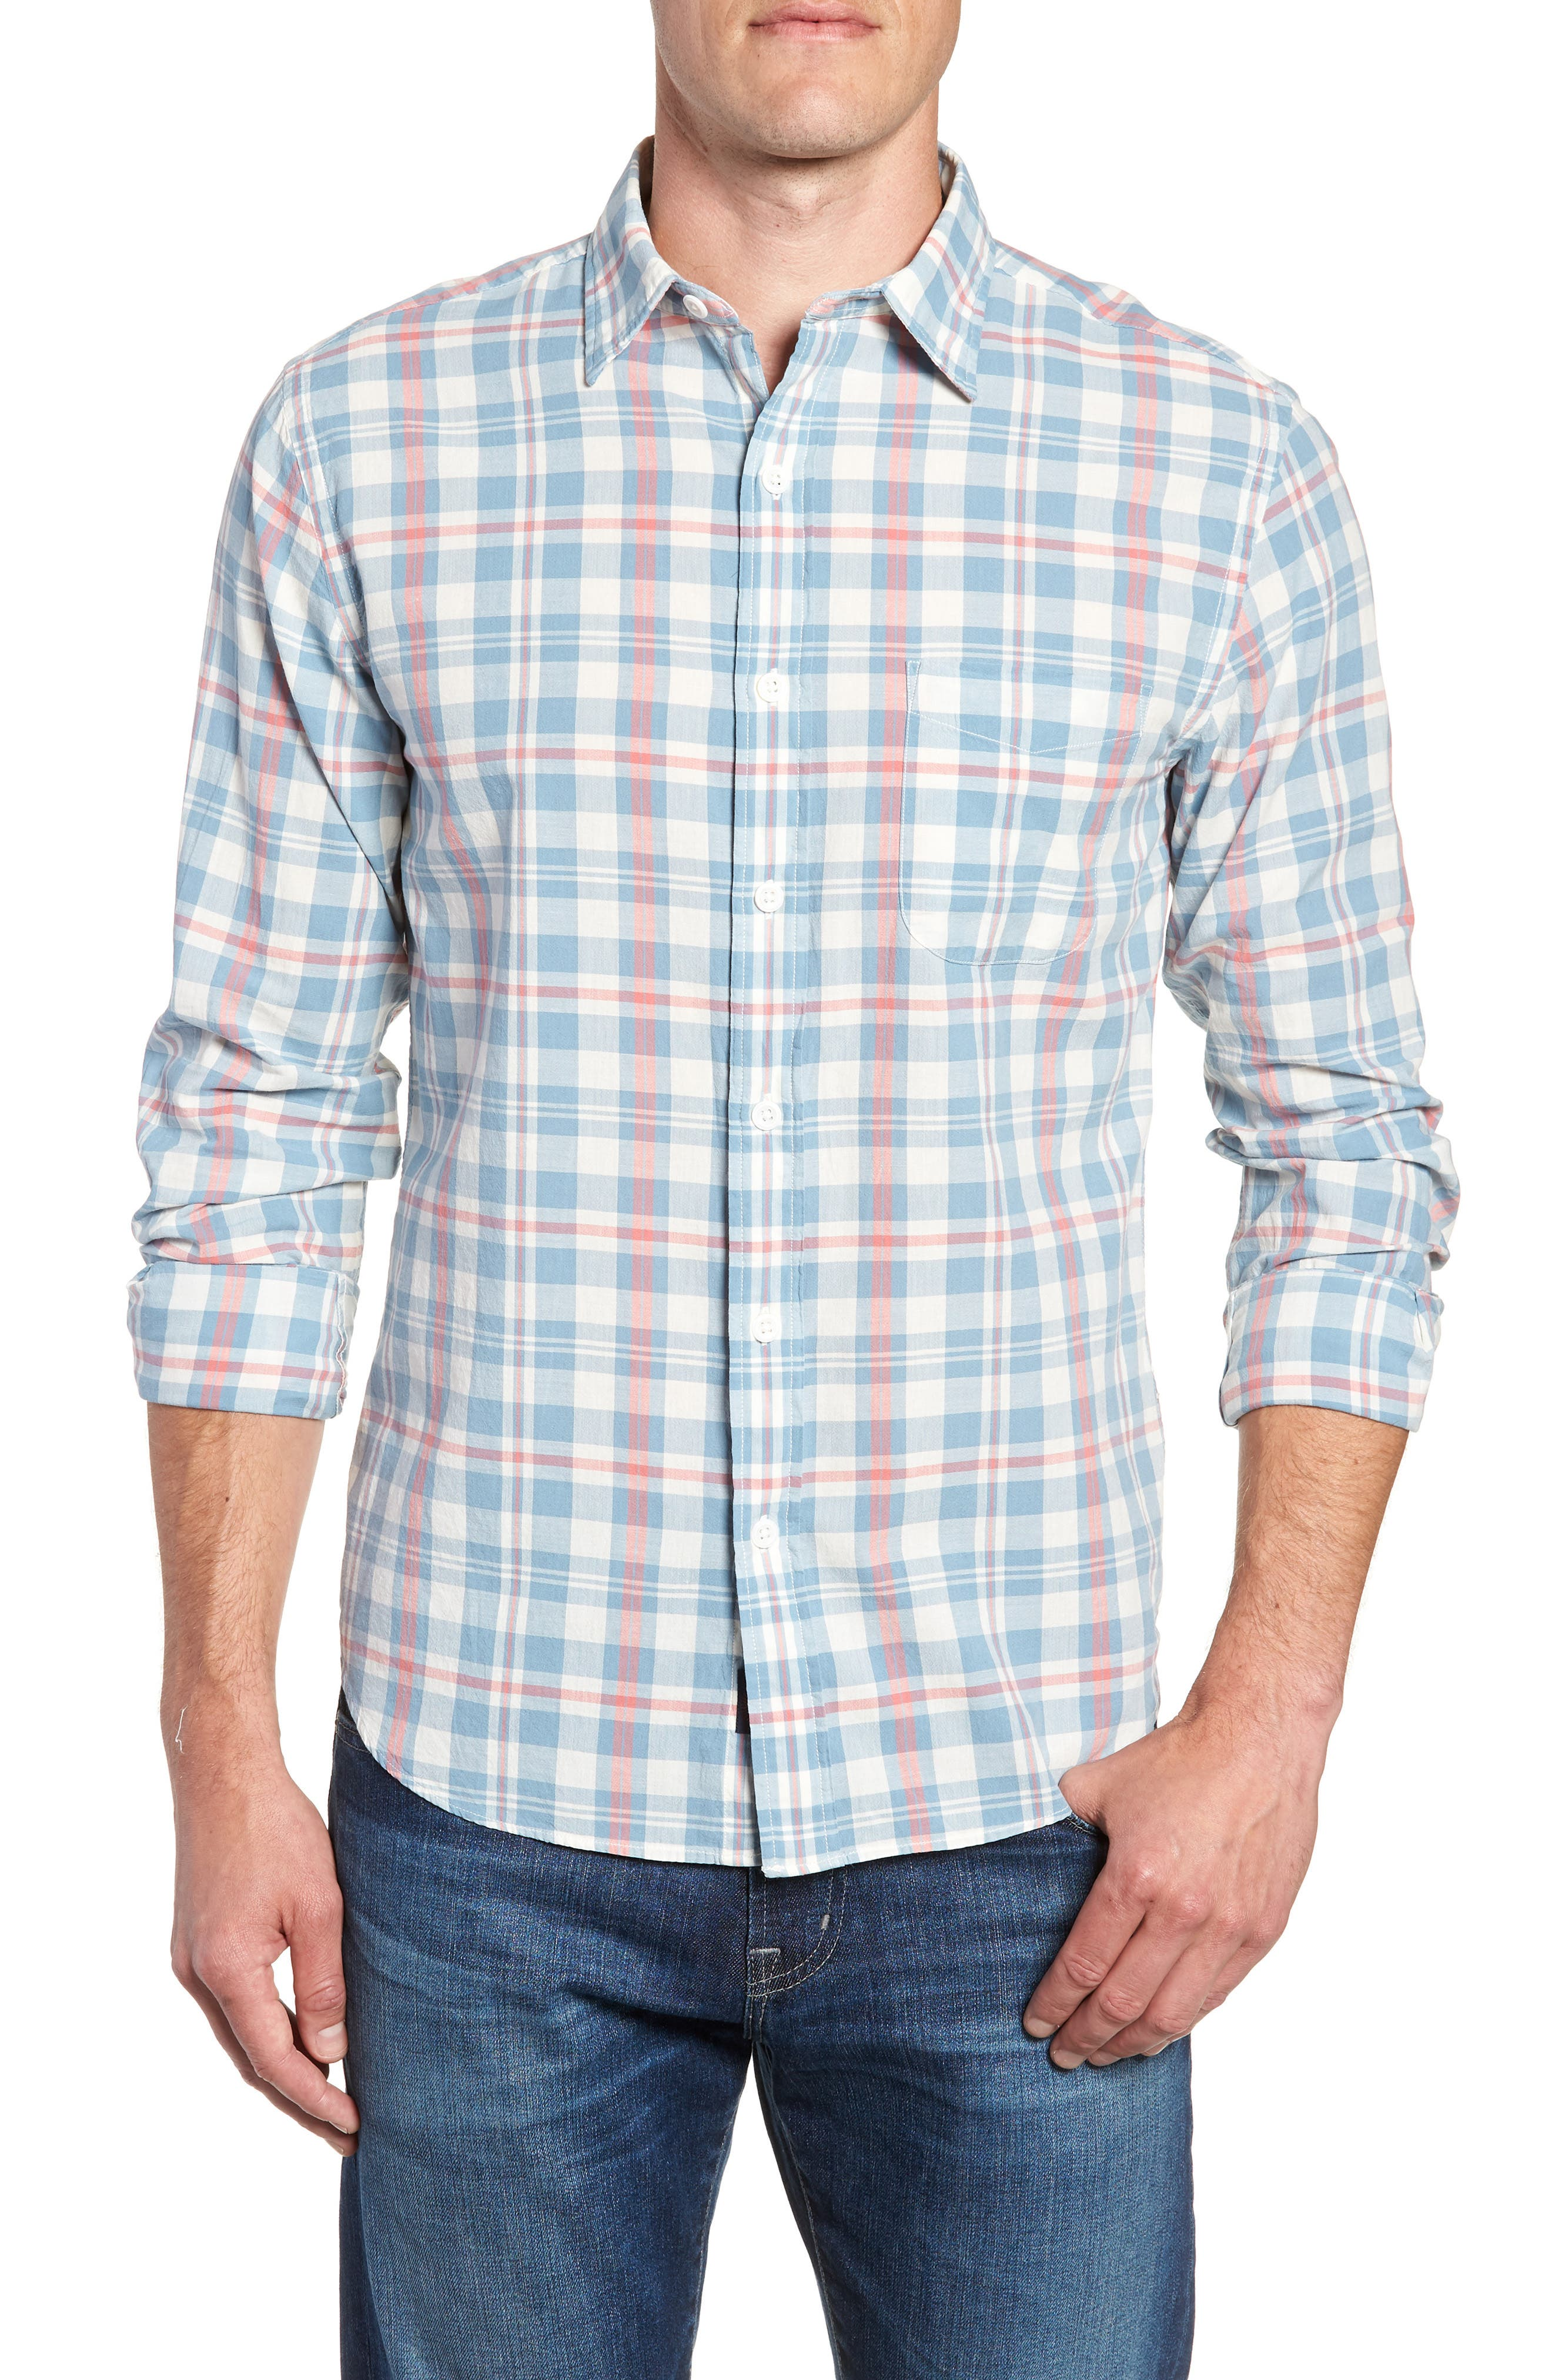 Ventura Plaid Sport Shirt,                             Main thumbnail 1, color,                             Washed Blue Cream